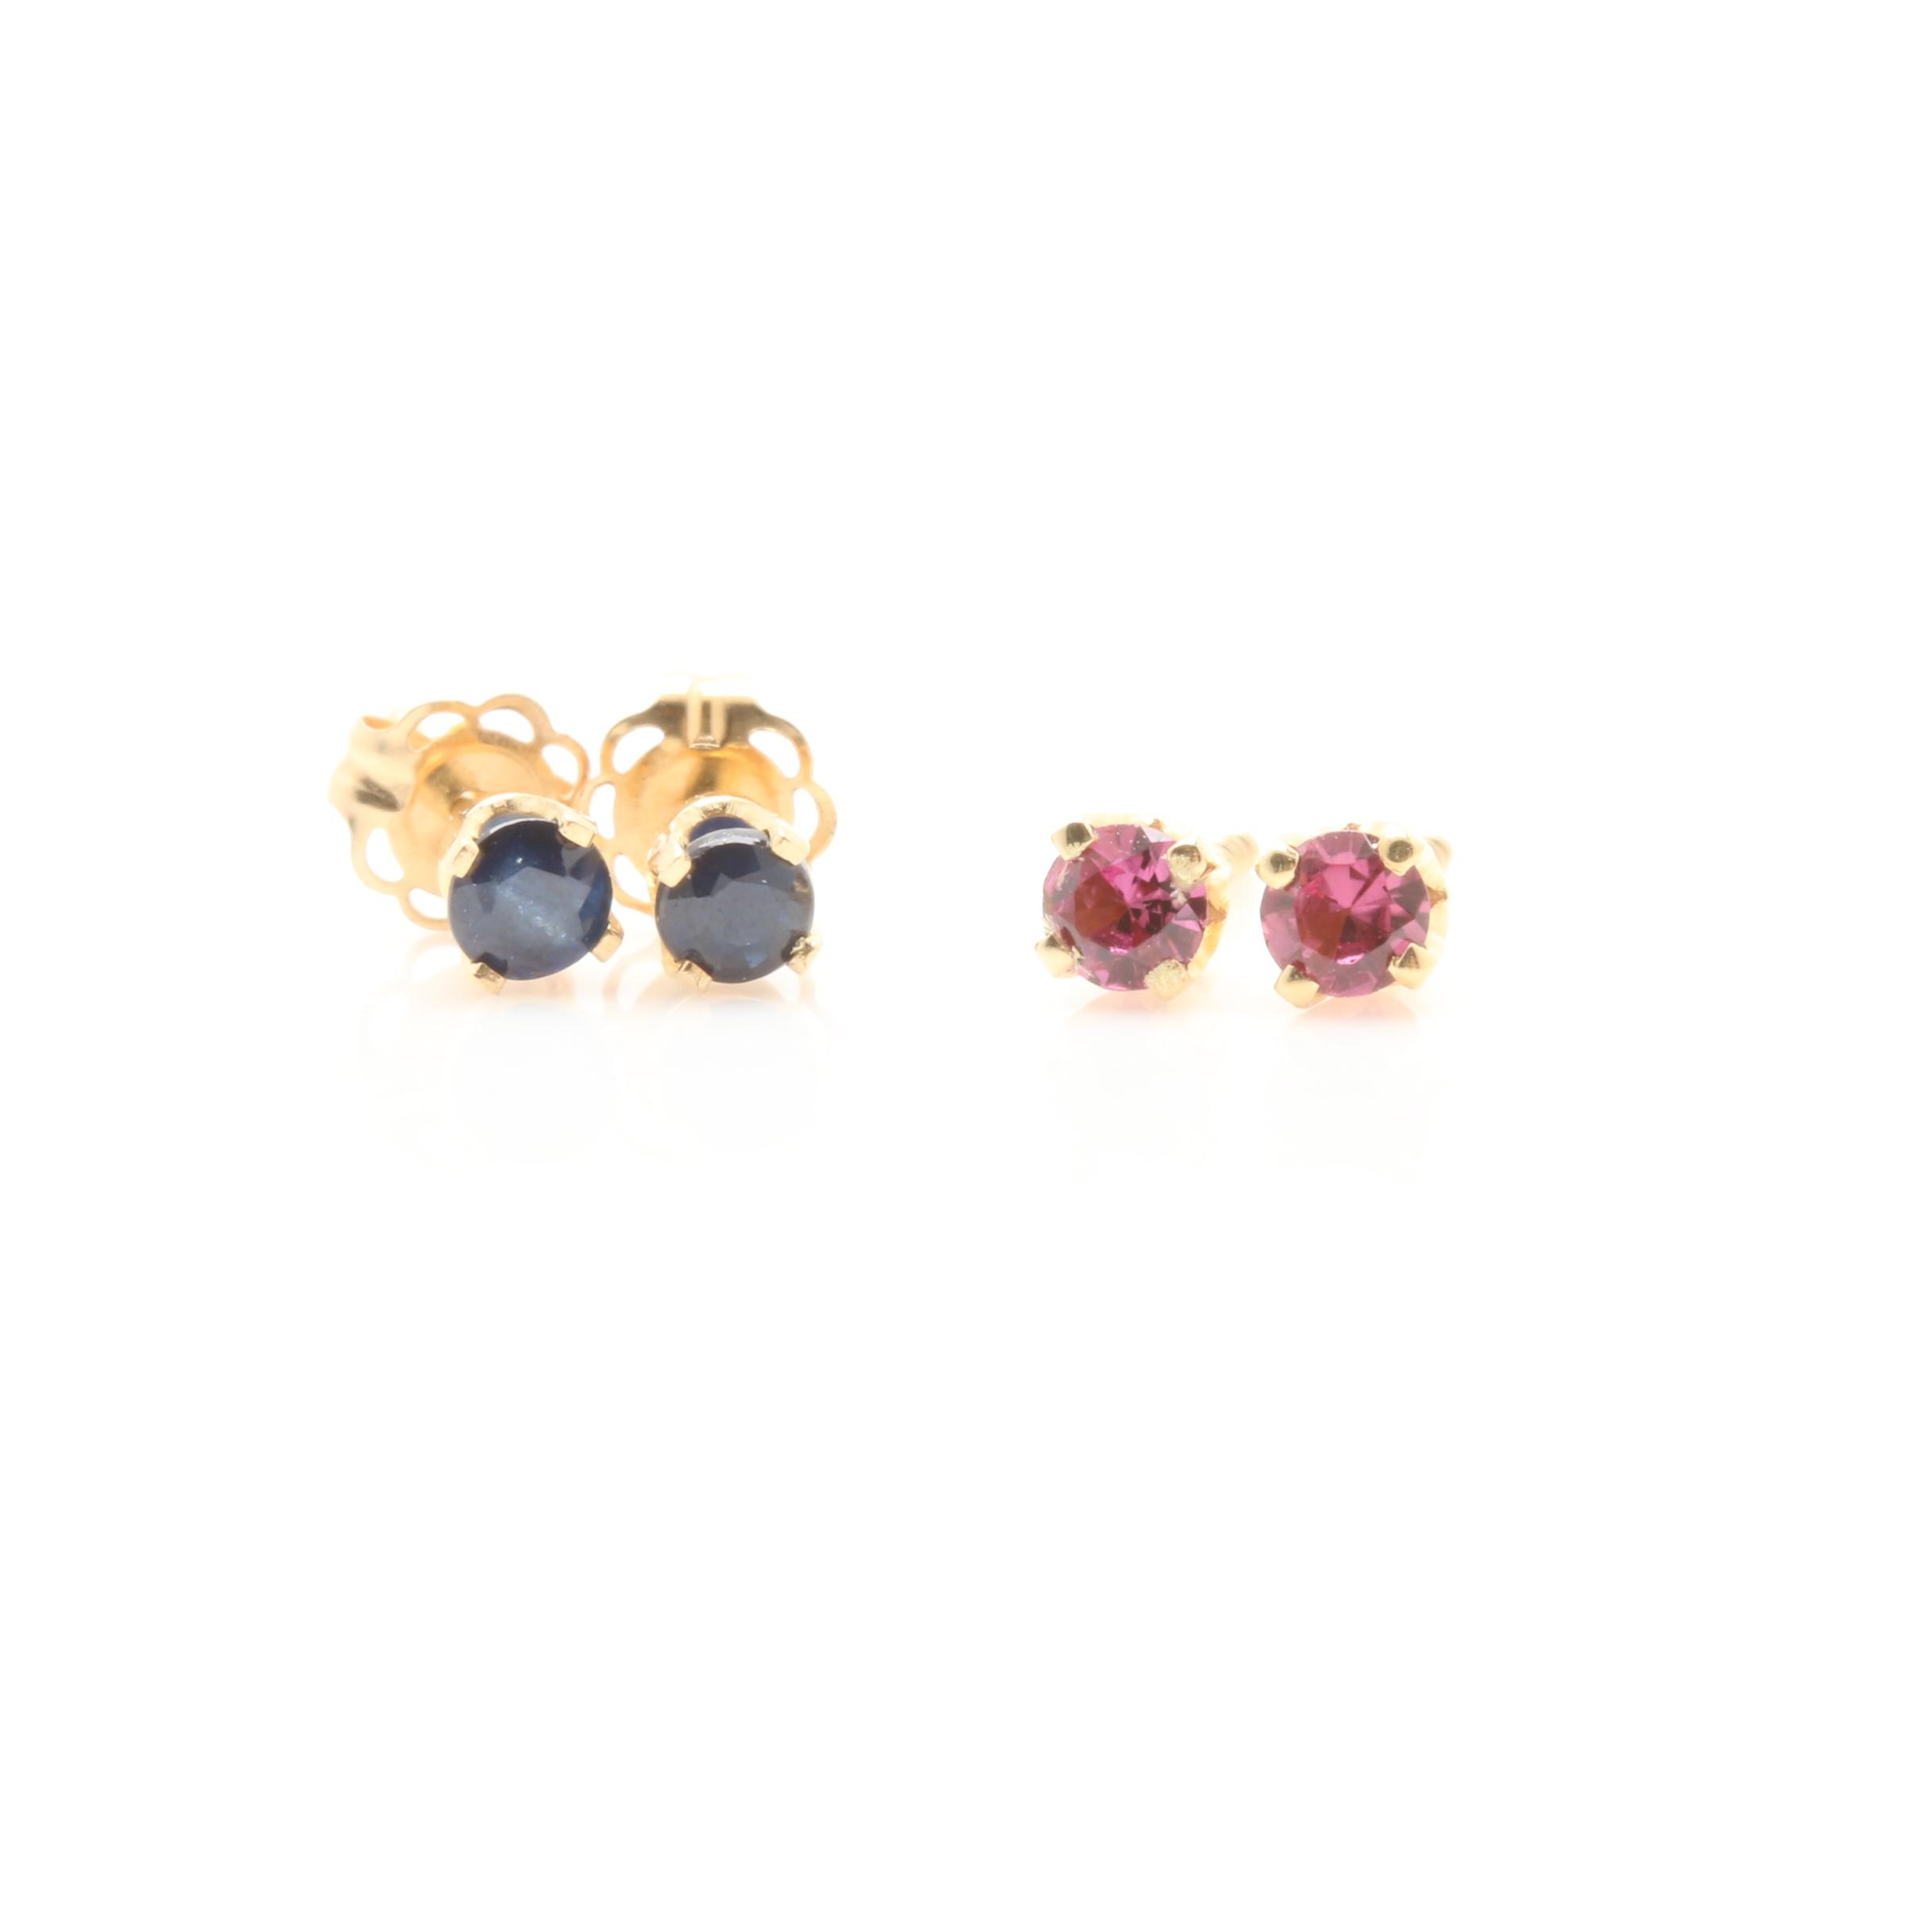 14K Yellow Gold Rhodolite Garnet and Sapphire Stud Earrings